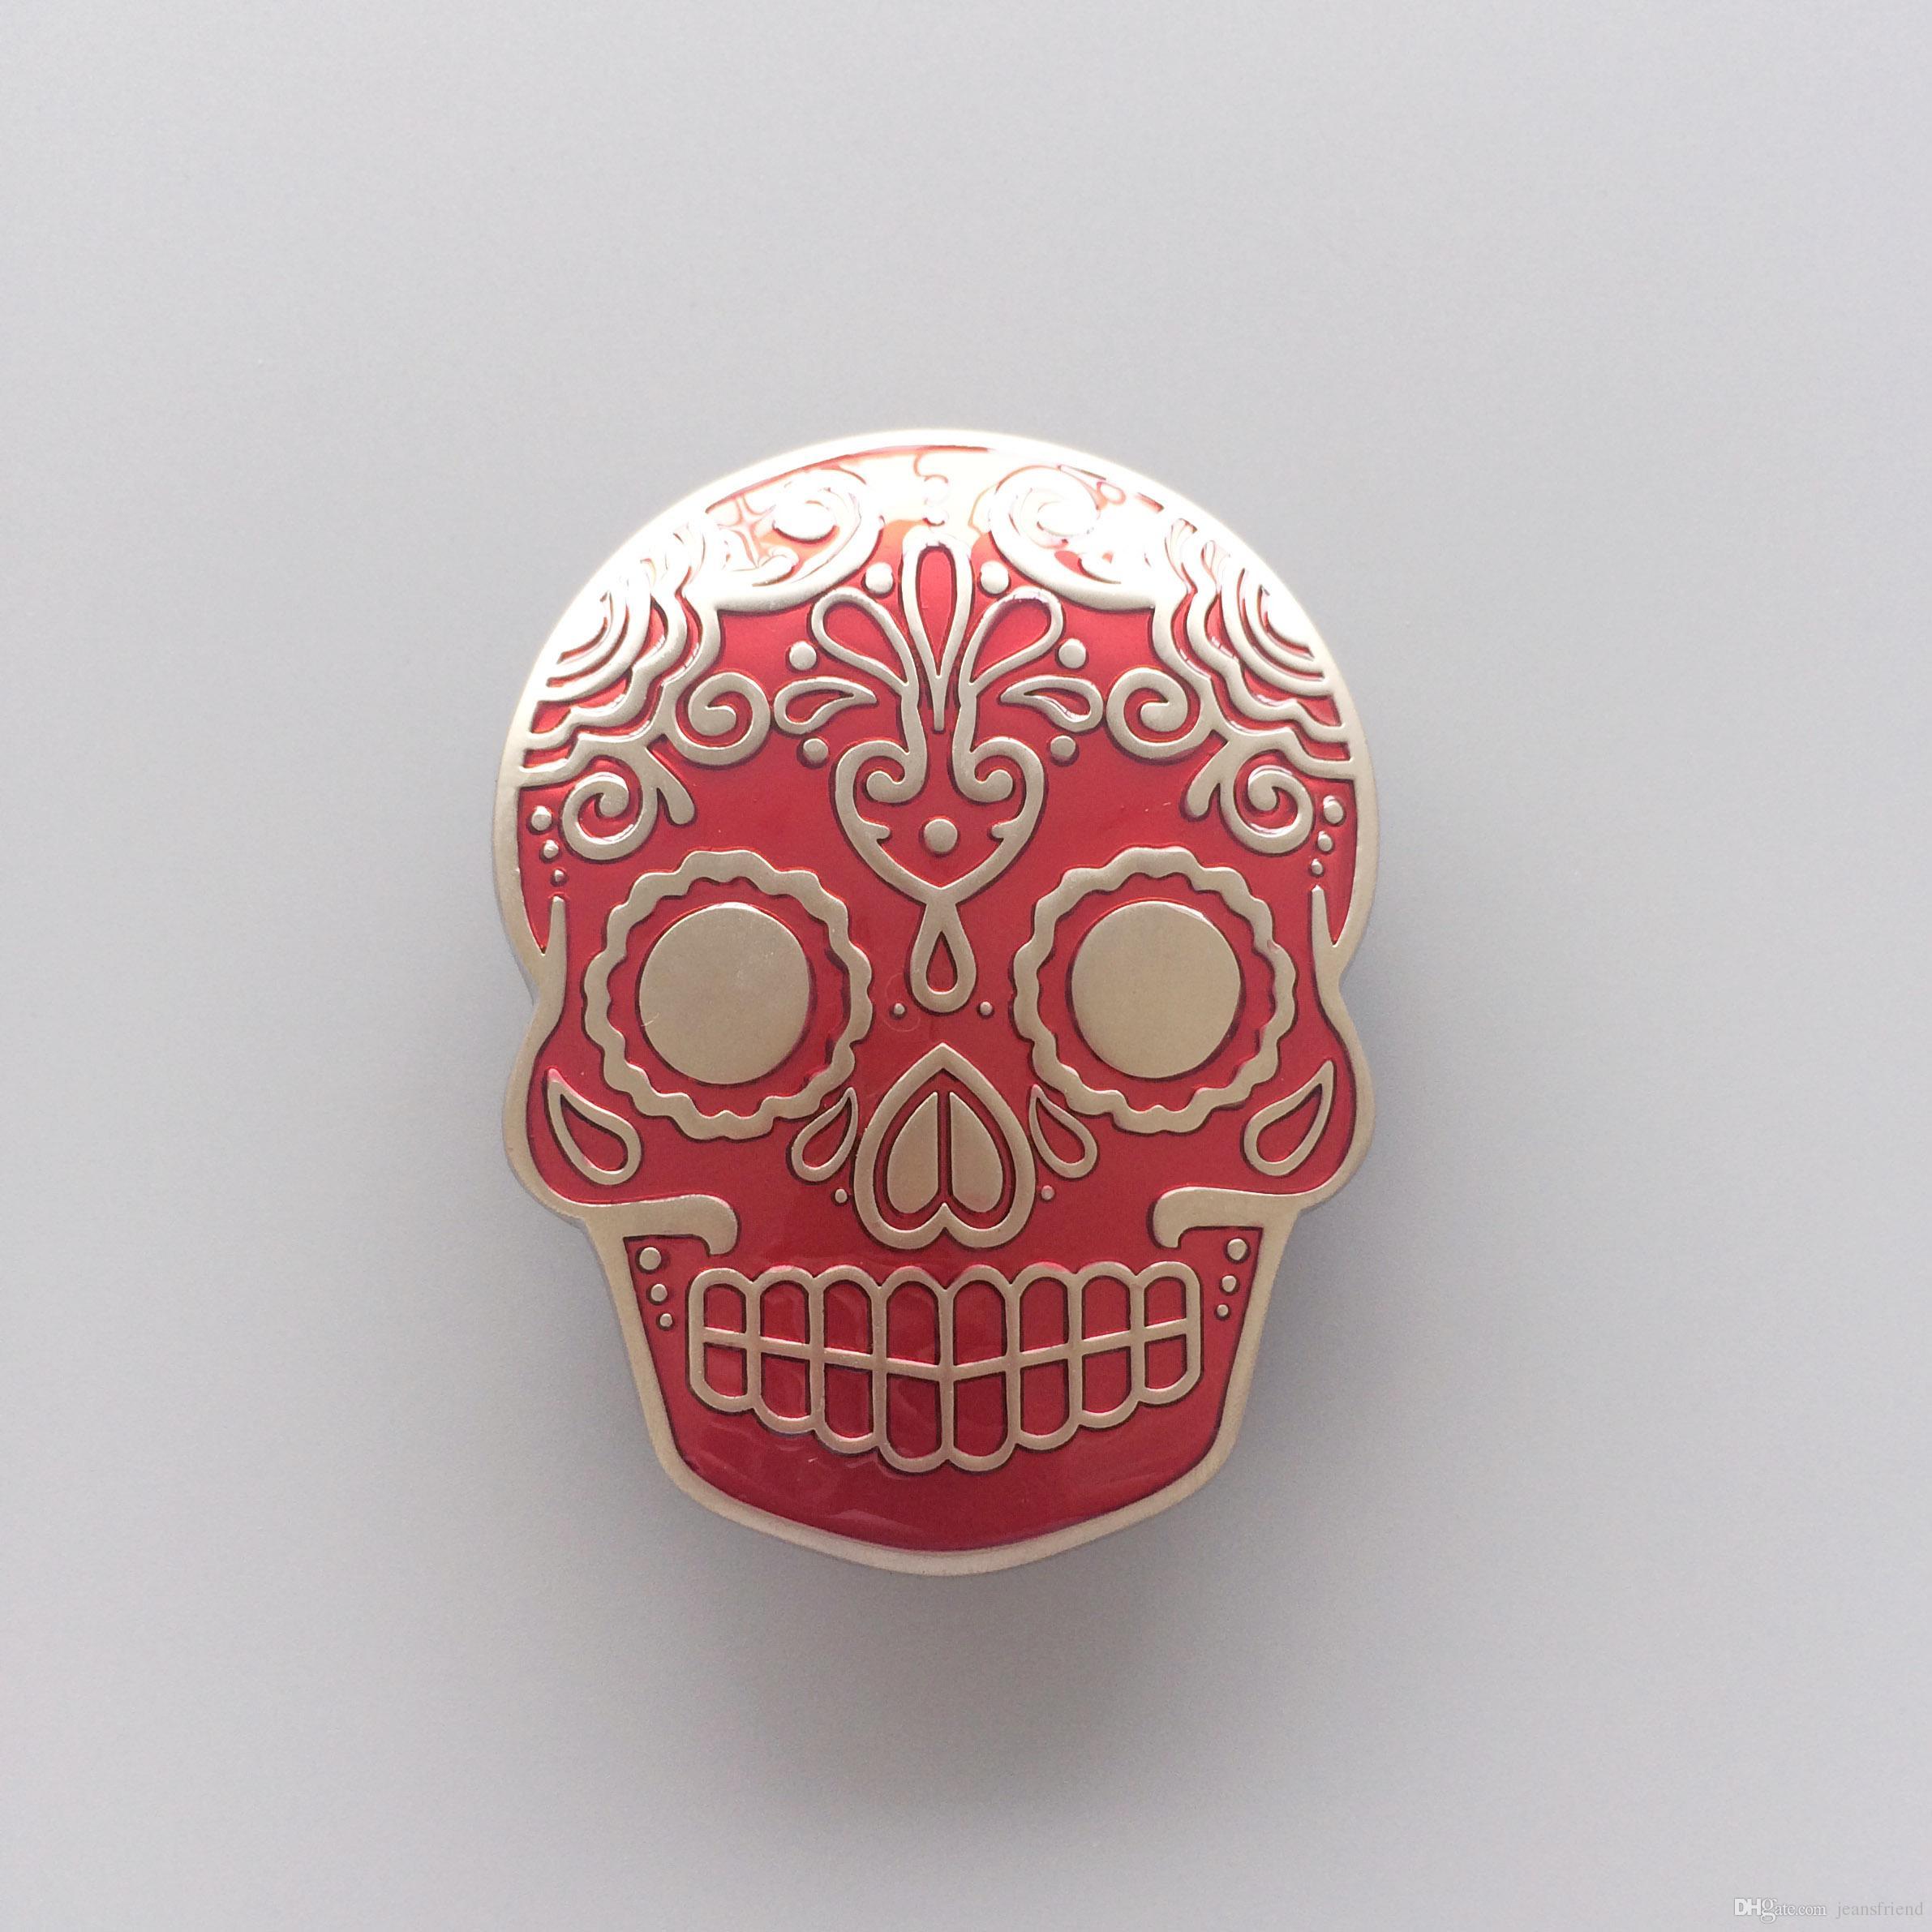 New Red Enamel Matter Silver Plated Tattoo Skull Belt Buckle Gurtelschnalle Boucle de ceinture